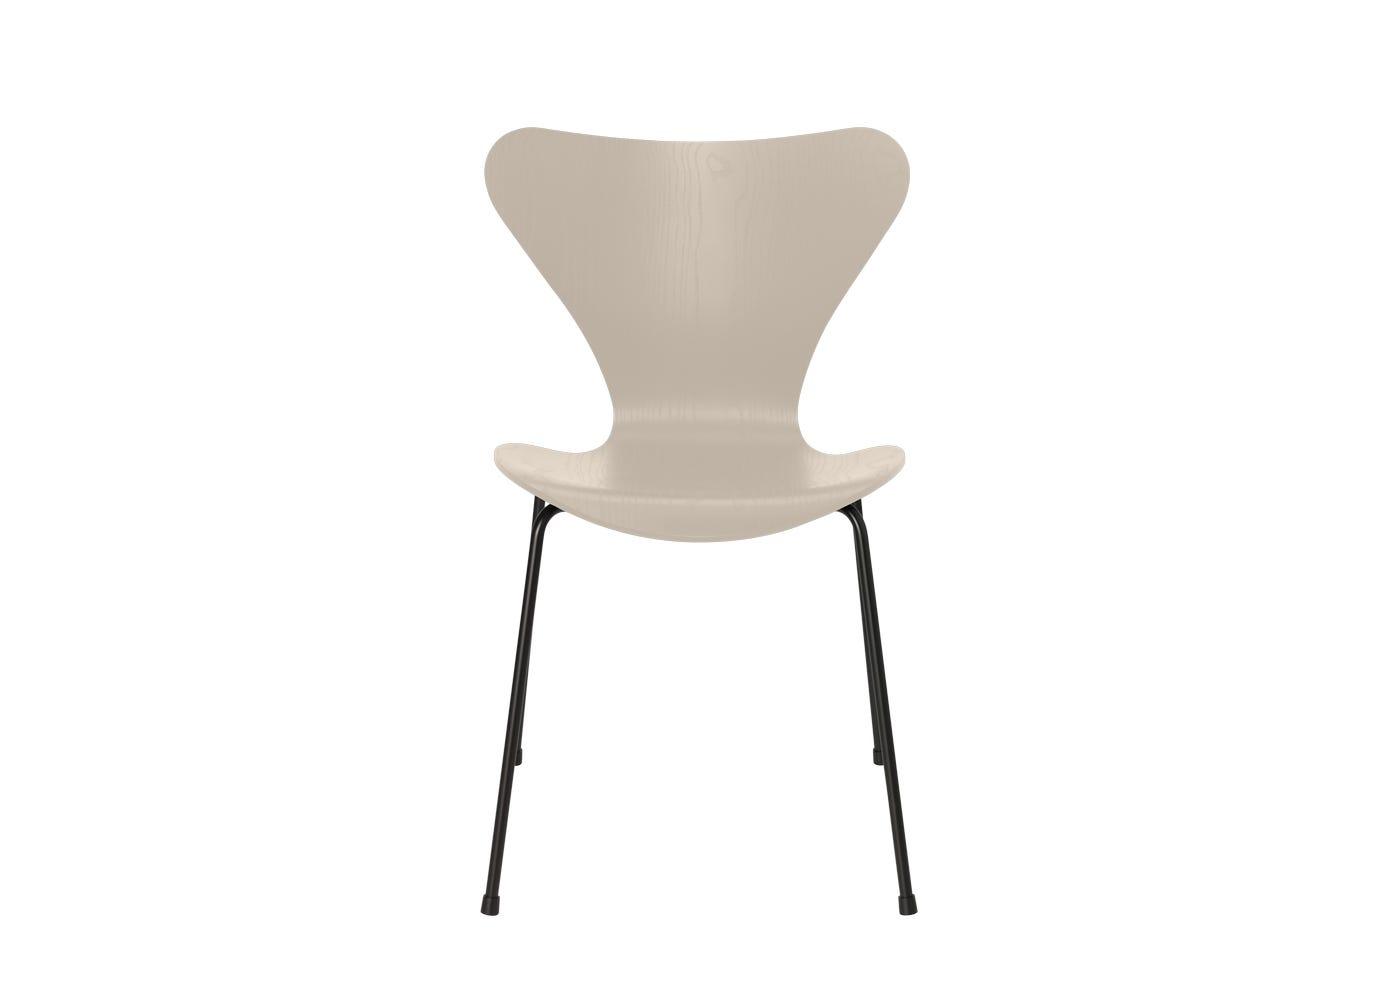 Fritz Hansen Series 7 Chair Coloured Ash Black Legs Light Beige